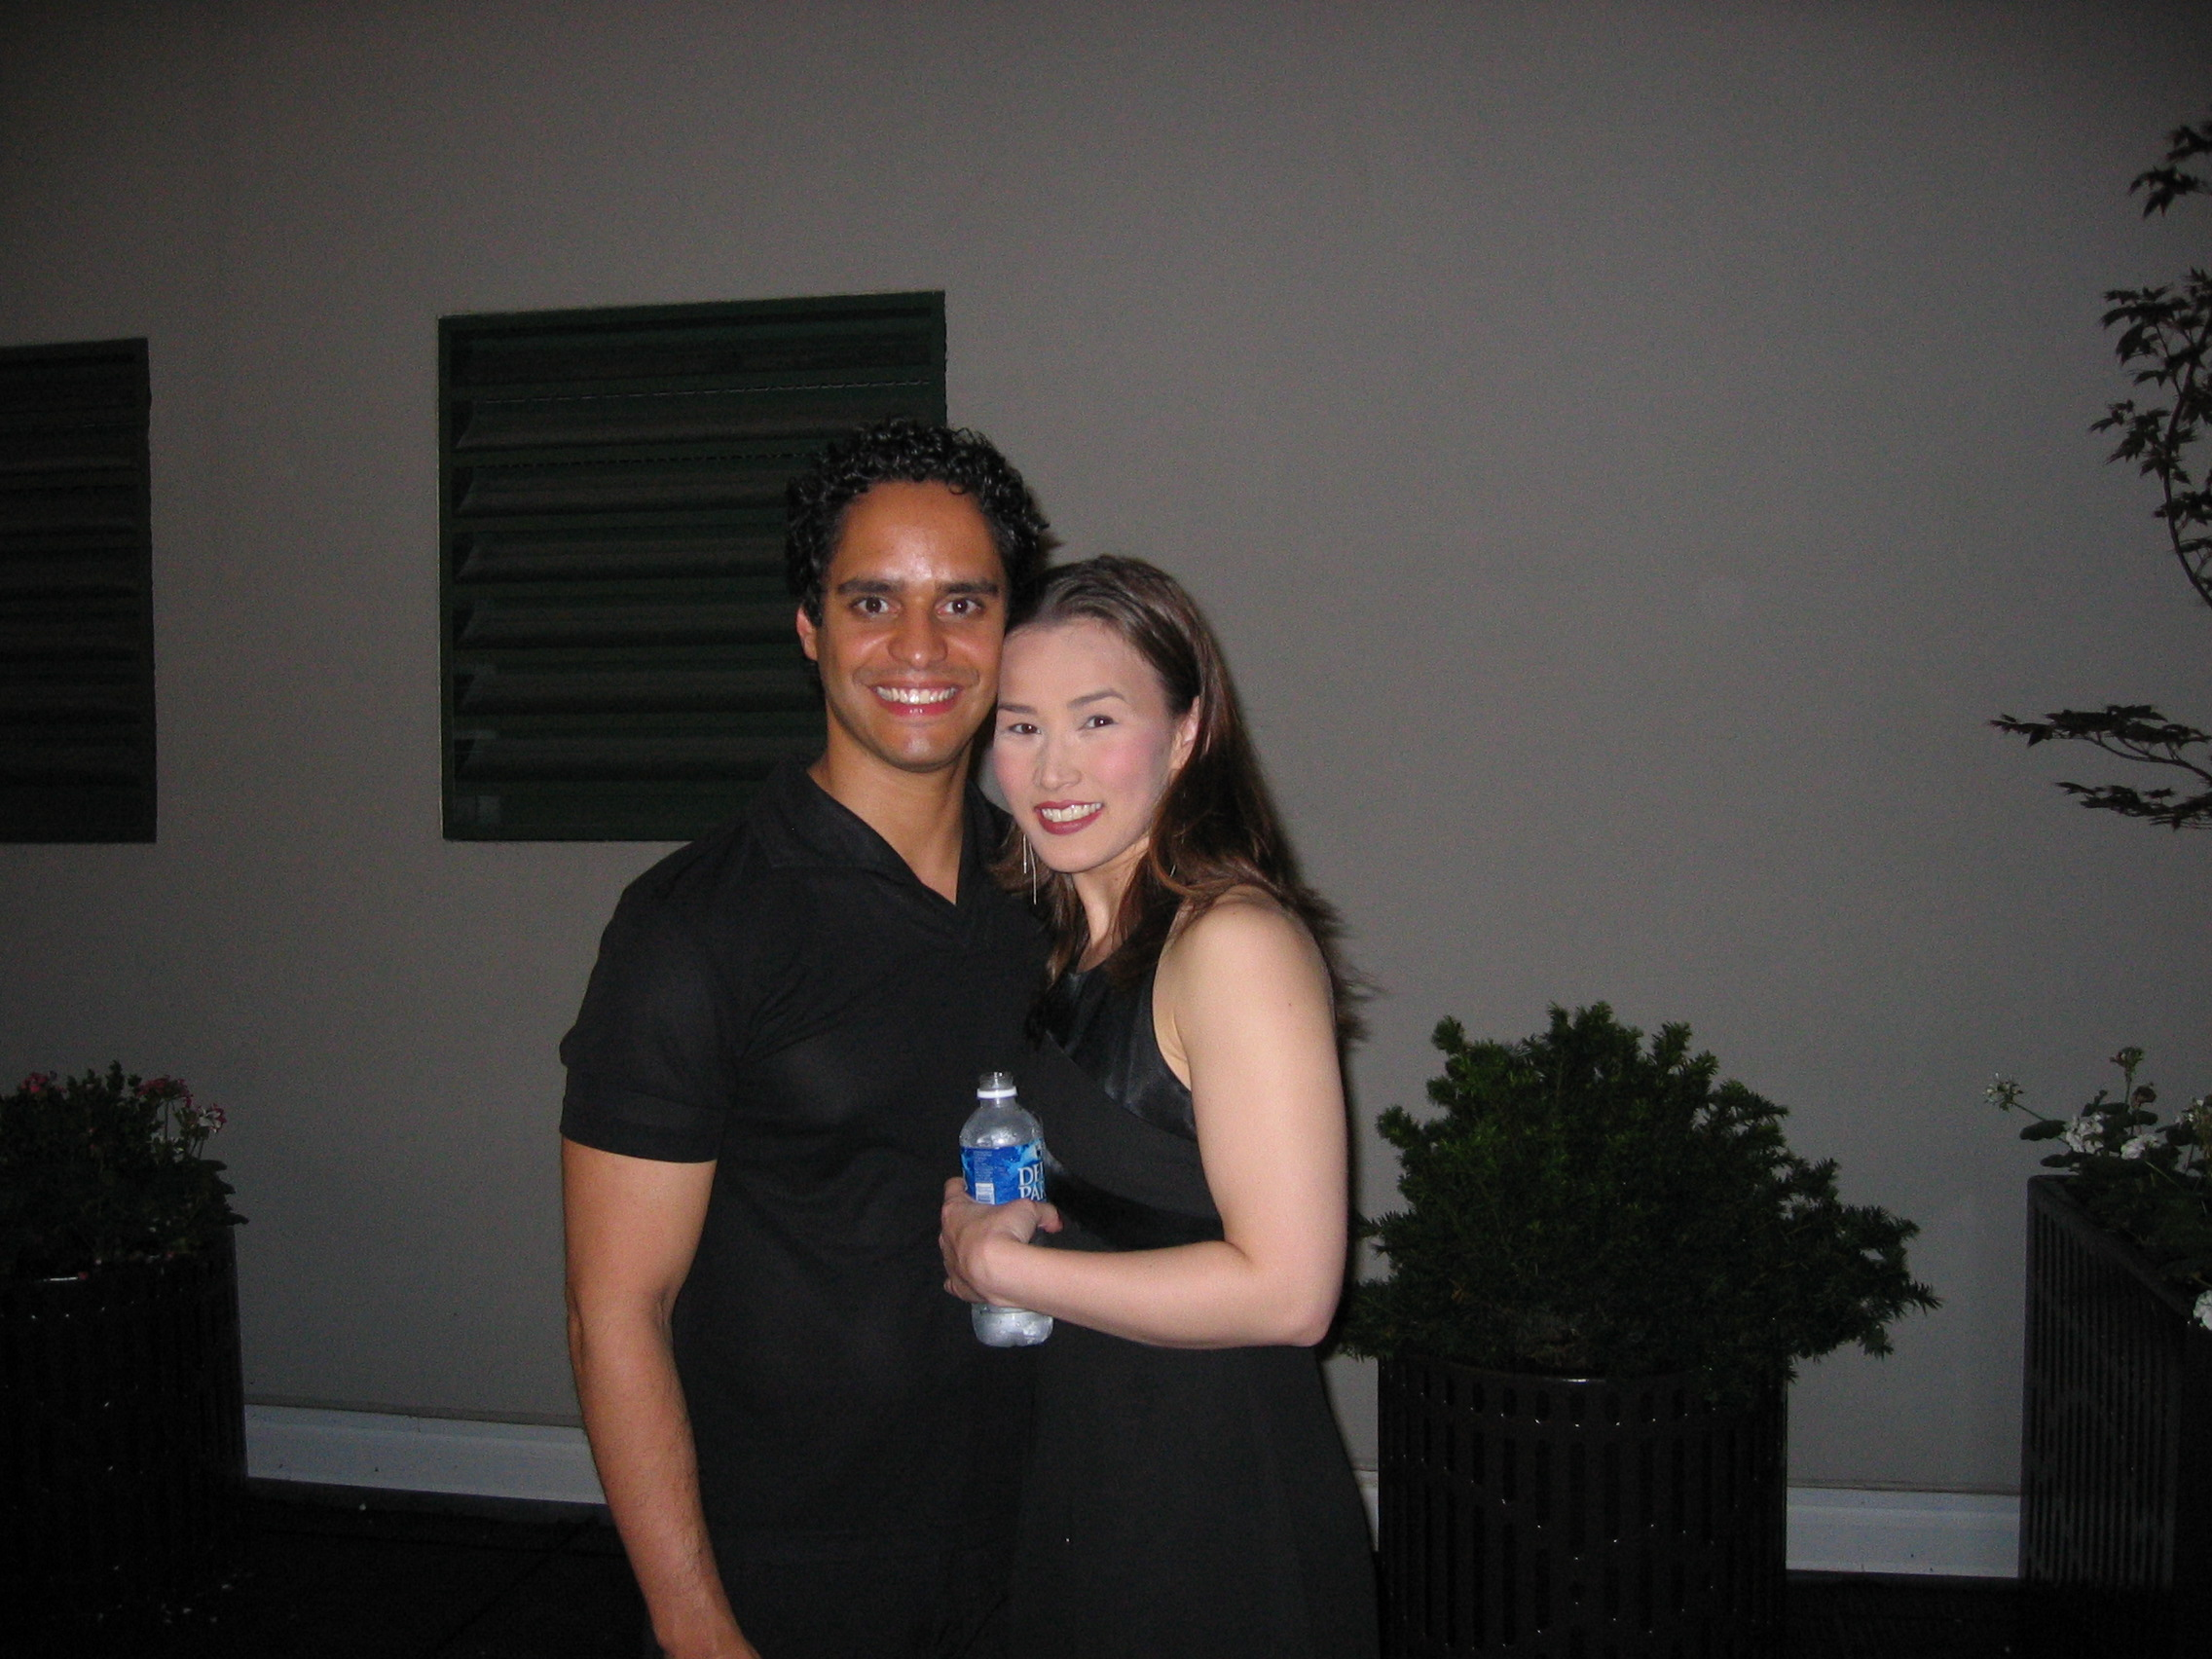 With Michelle Liu Coughlin